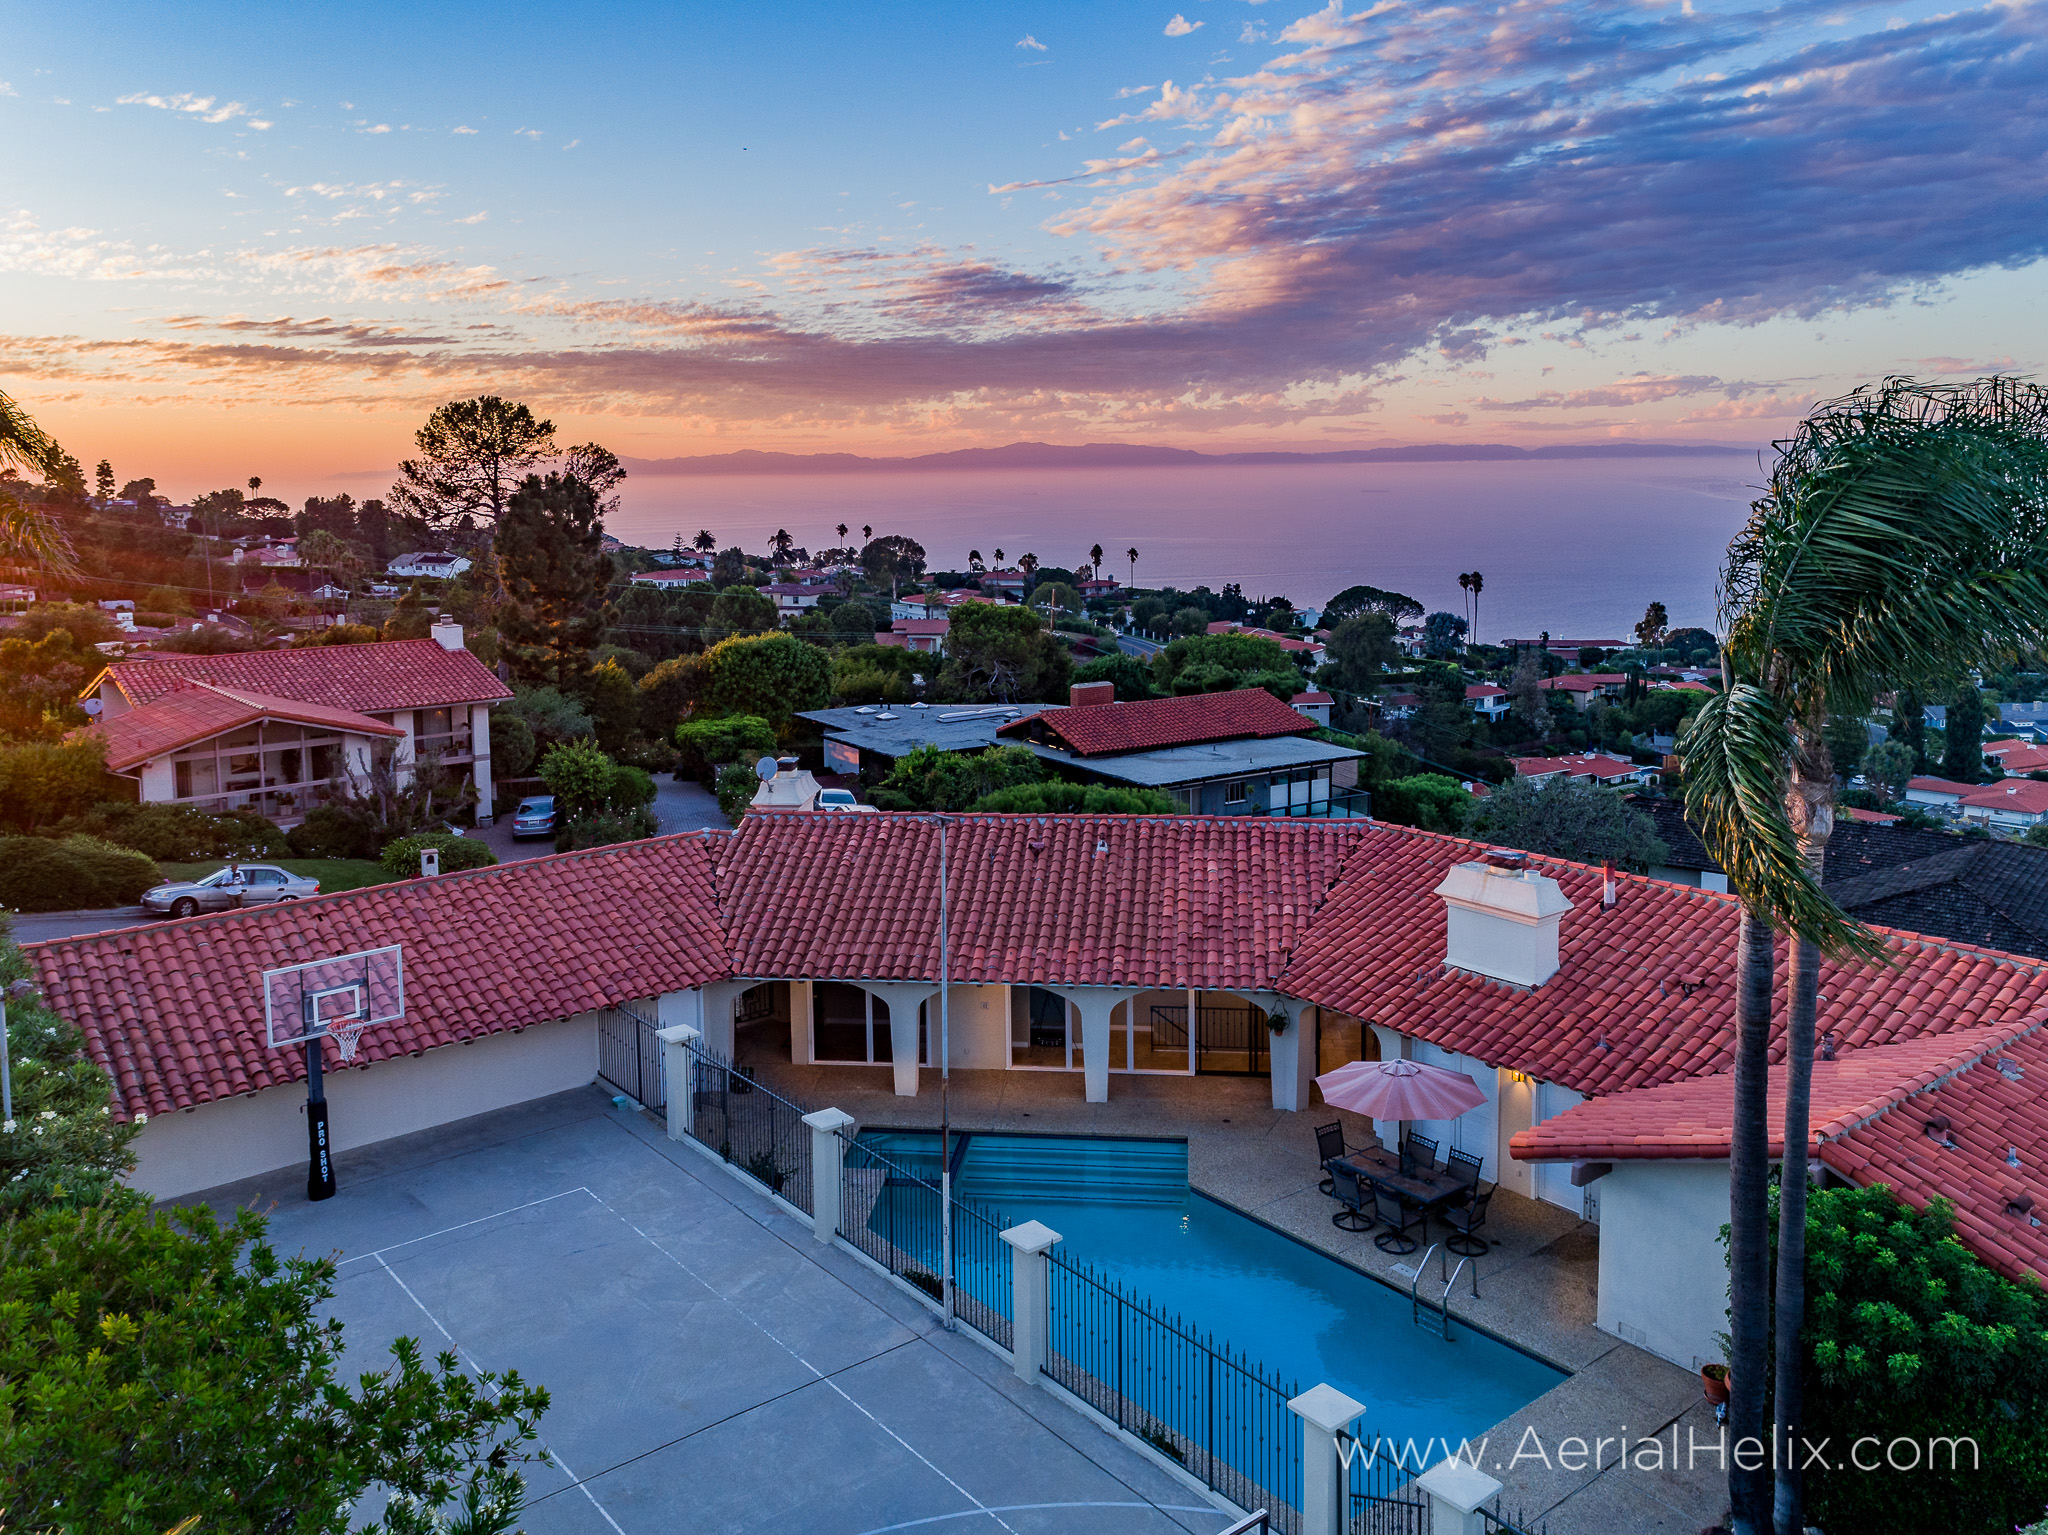 Woodfern Drive - HELIX Real Estate Aerial Photographer-43.jpg